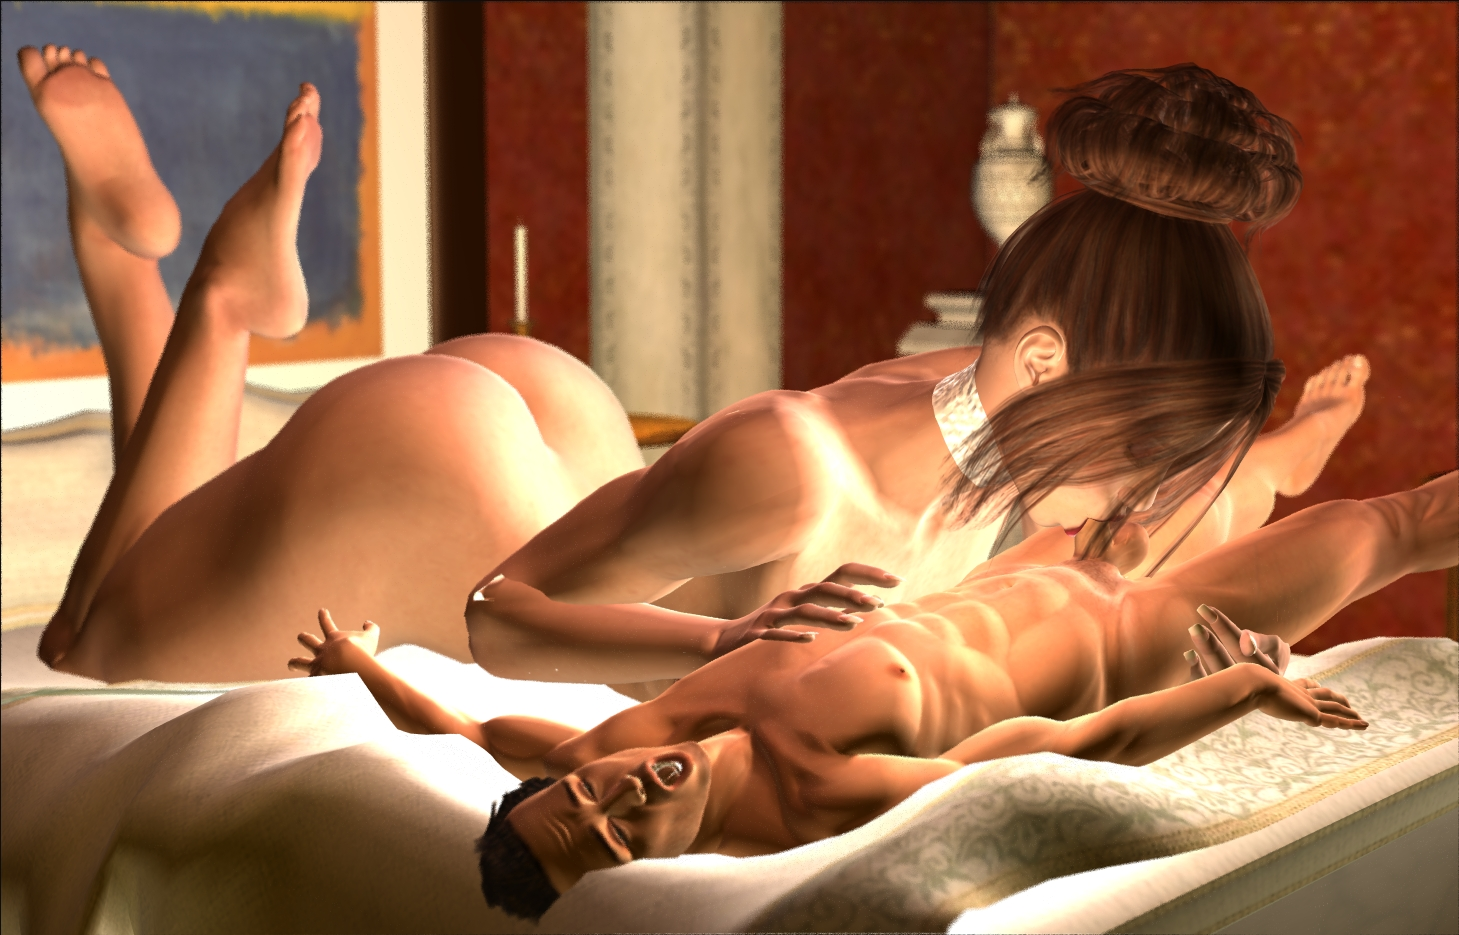 giantess-phone-sex-girl-naked-volleyball